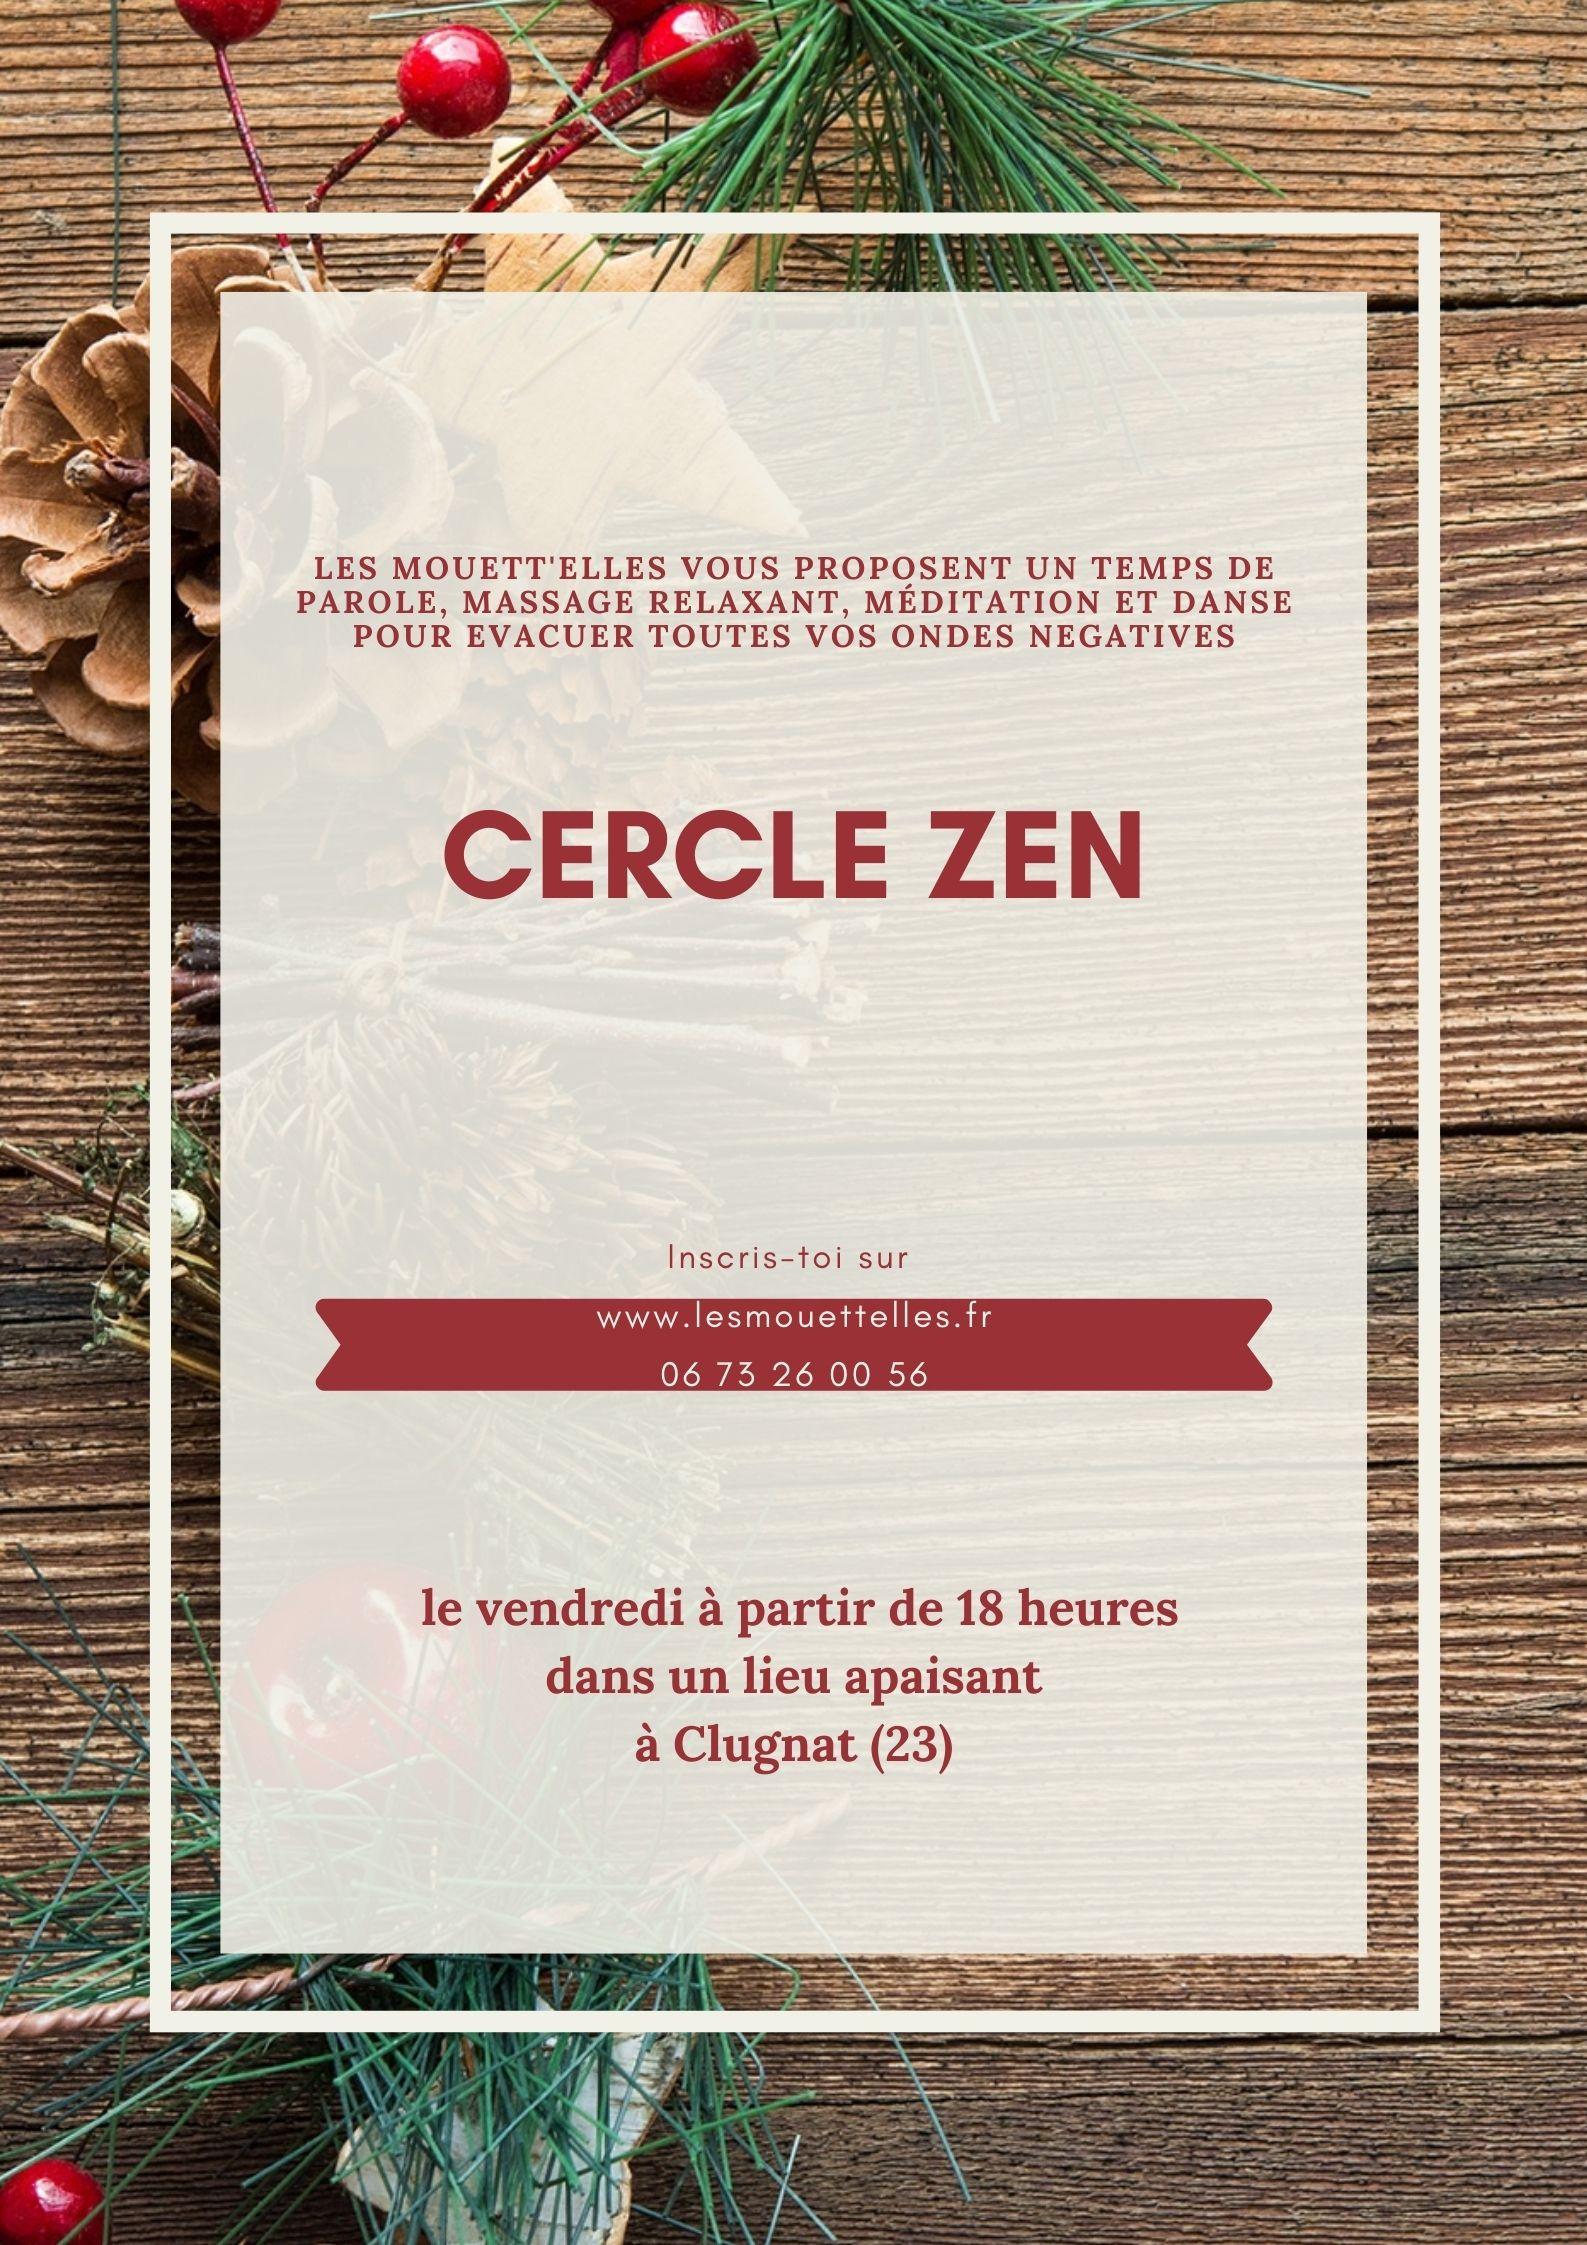 Cercle zen